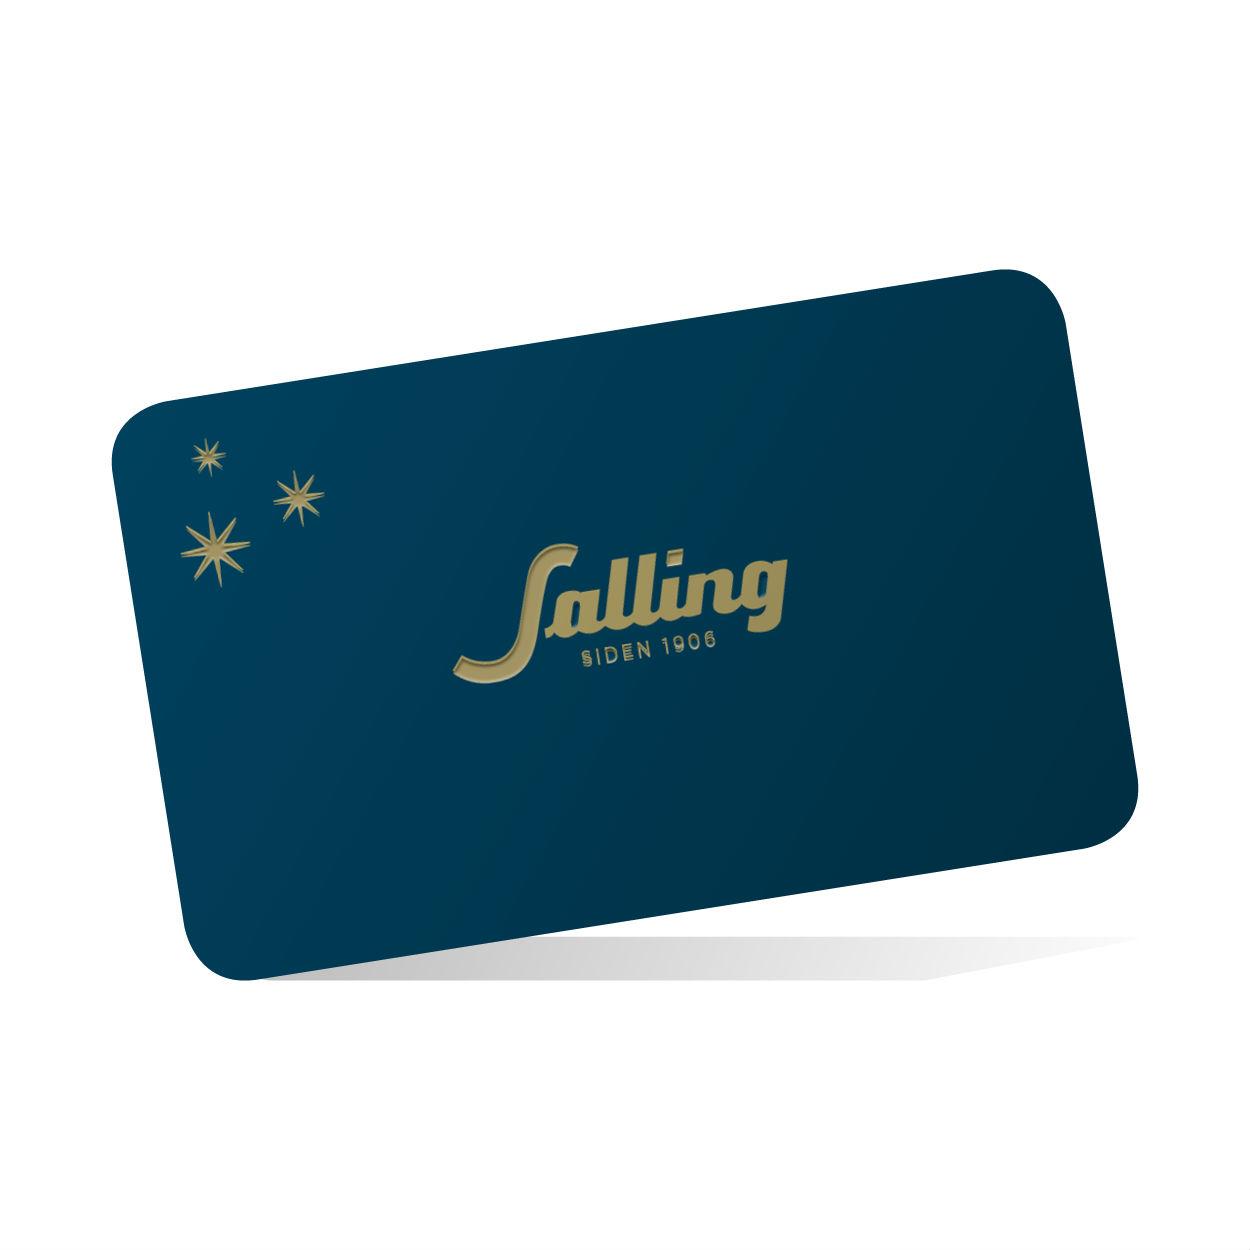 Salling gavekort - 800 kr